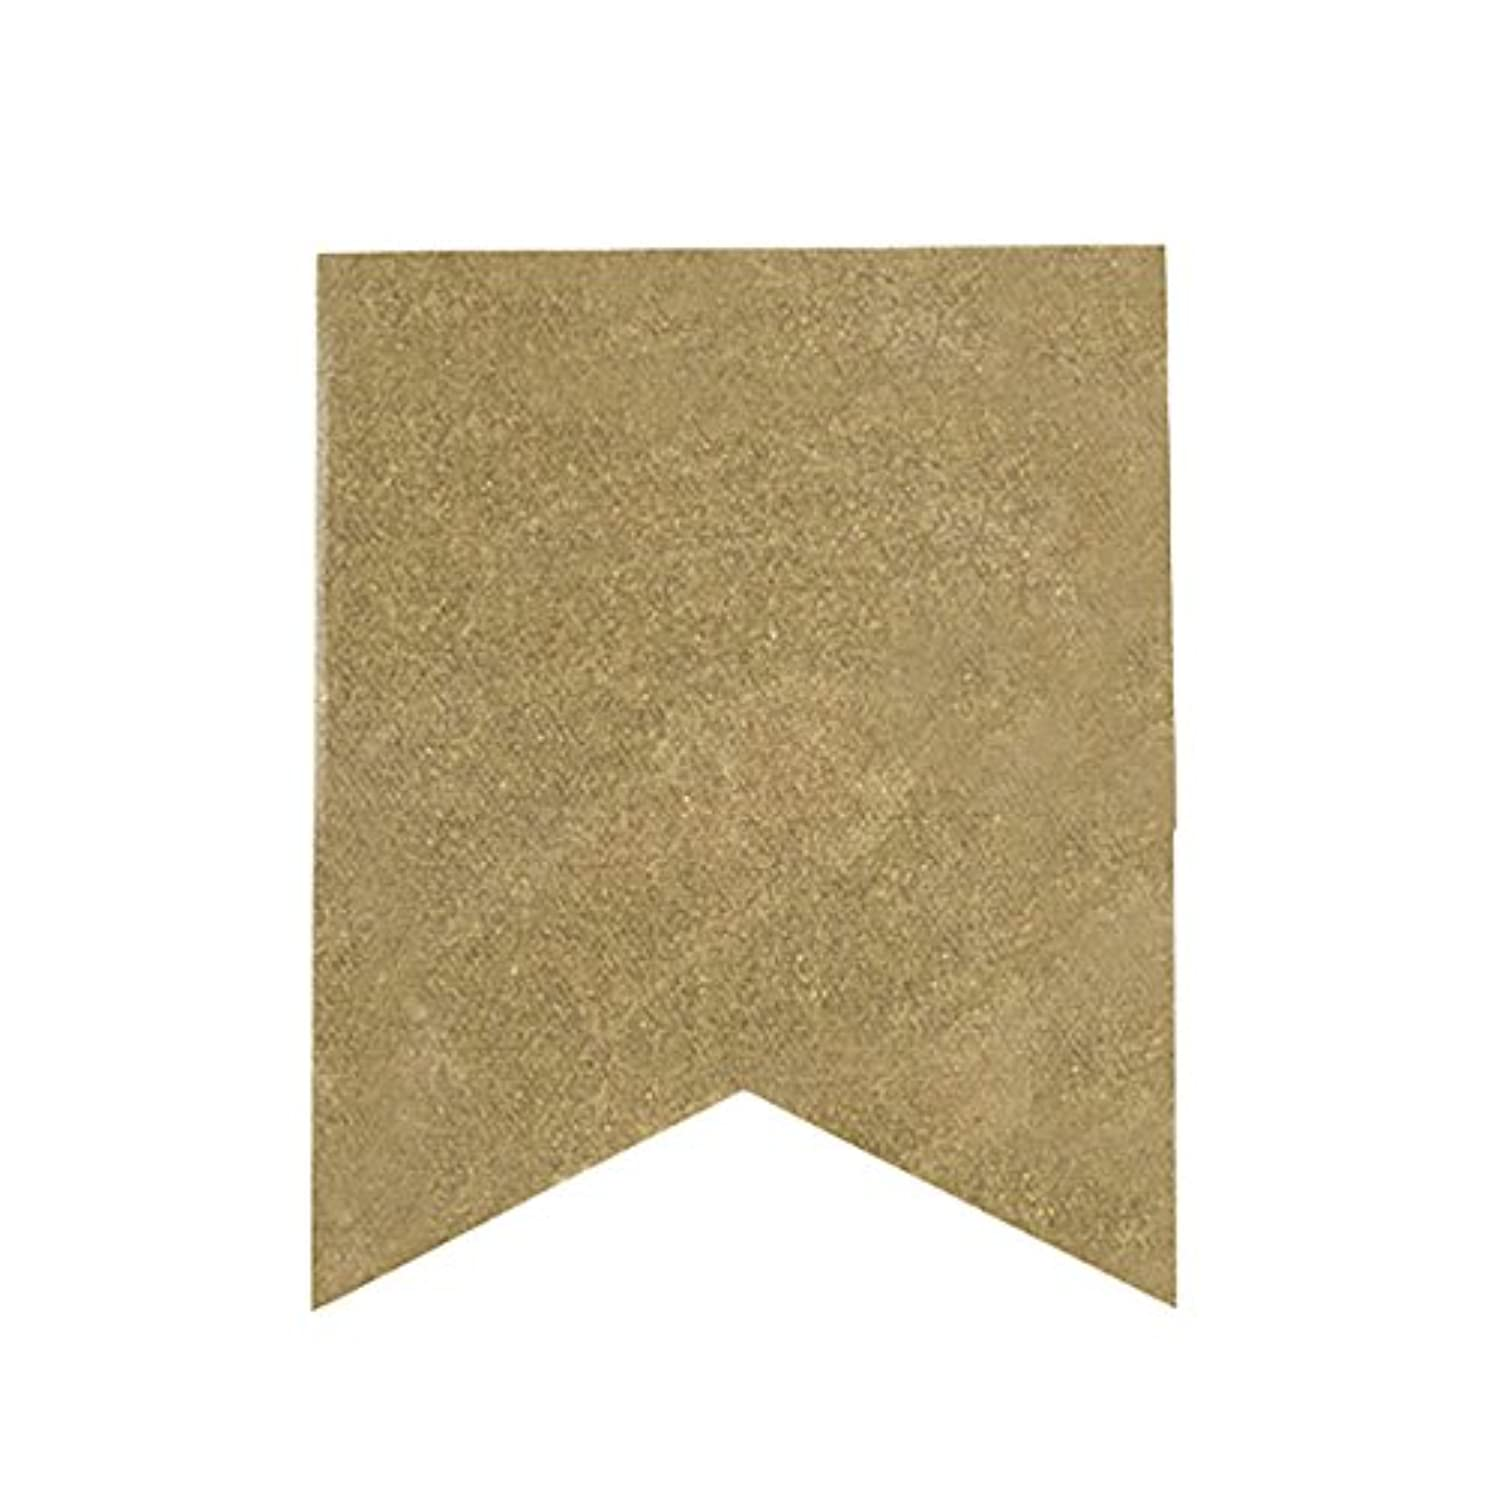 Darice Fishtail Design, Glittery Canvas Banner Flags in Gold Glitter